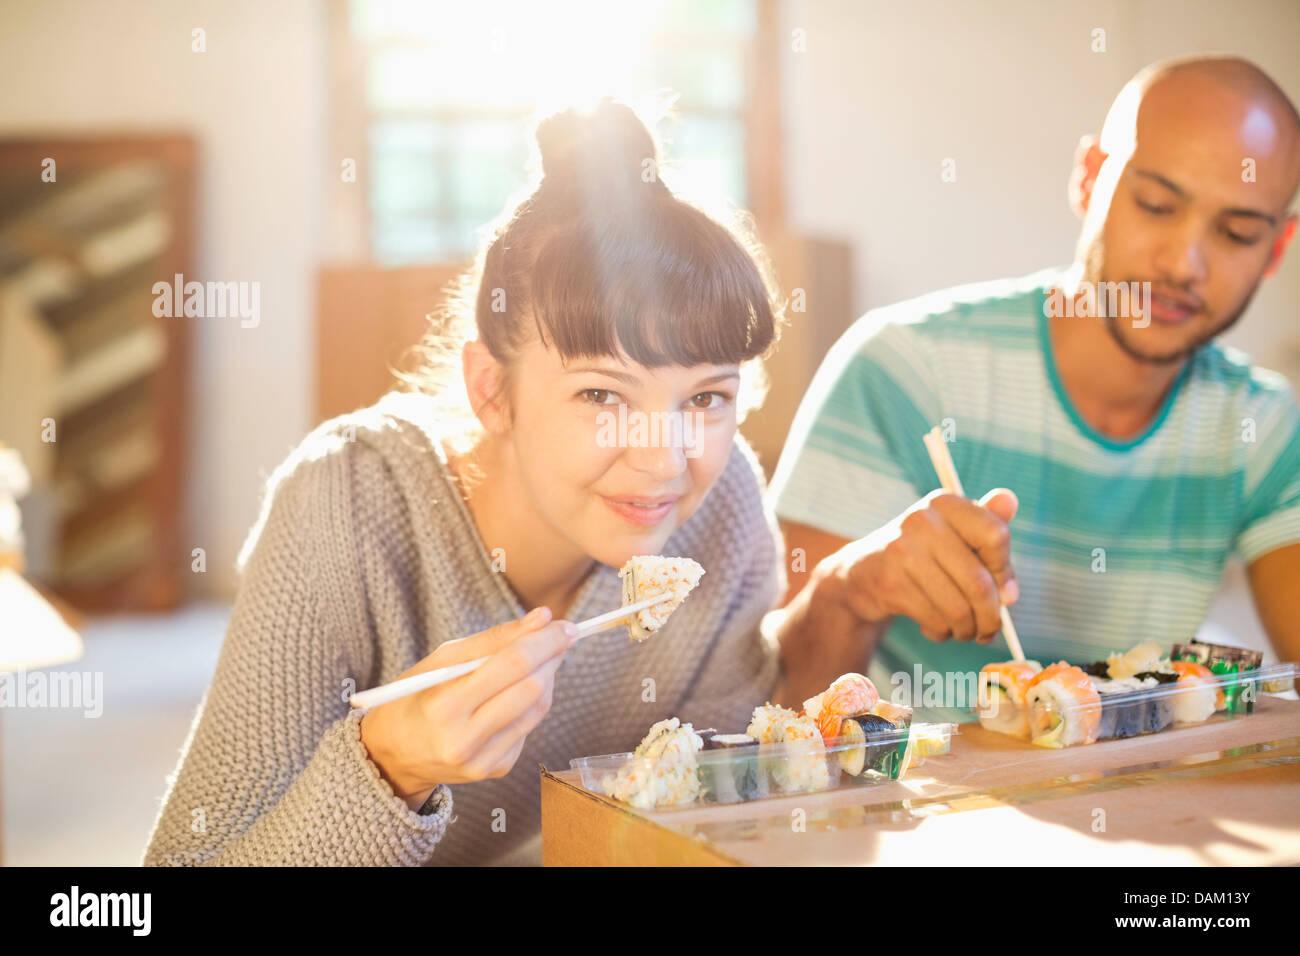 Paio mangiare sushi insieme Foto Stock